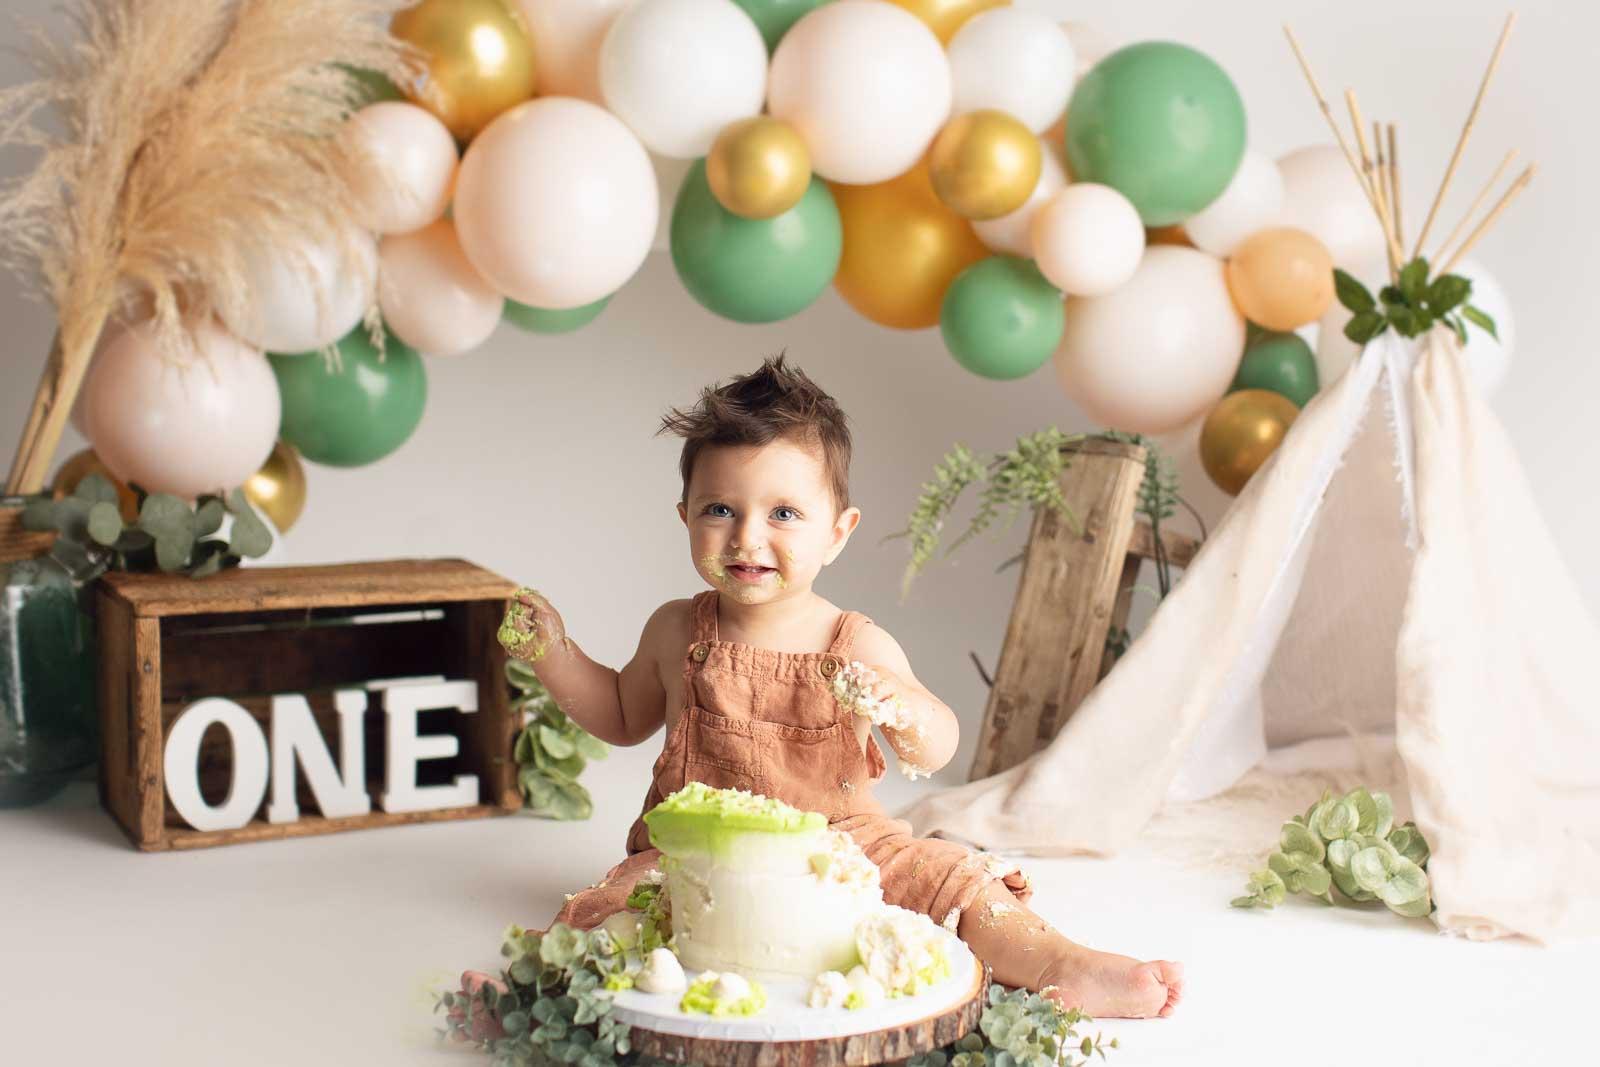 blond boy smashing cake in pastel green colour background